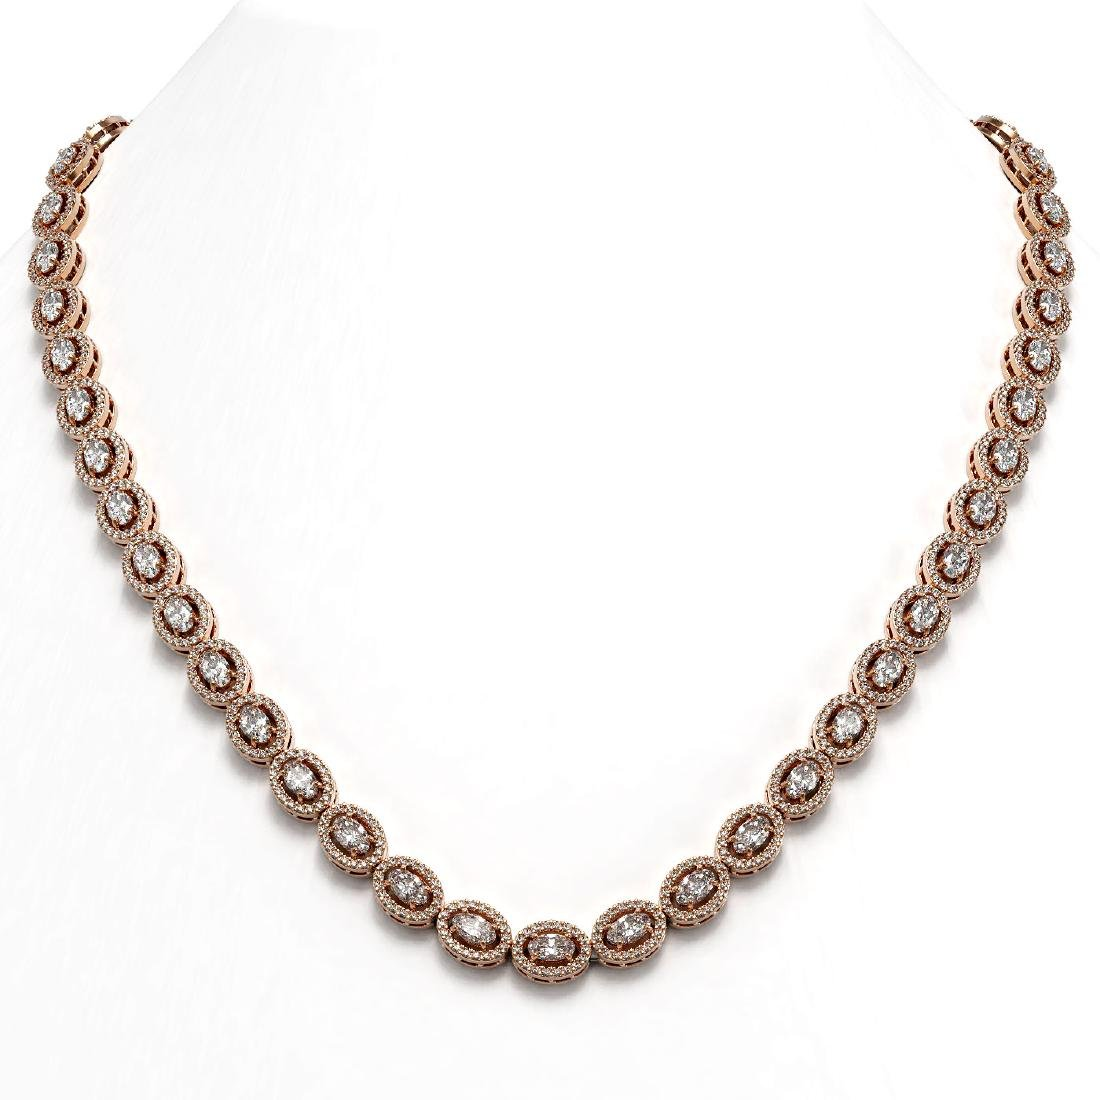 18.43 ctw Oval Diamond Necklace 18K Rose Gold -